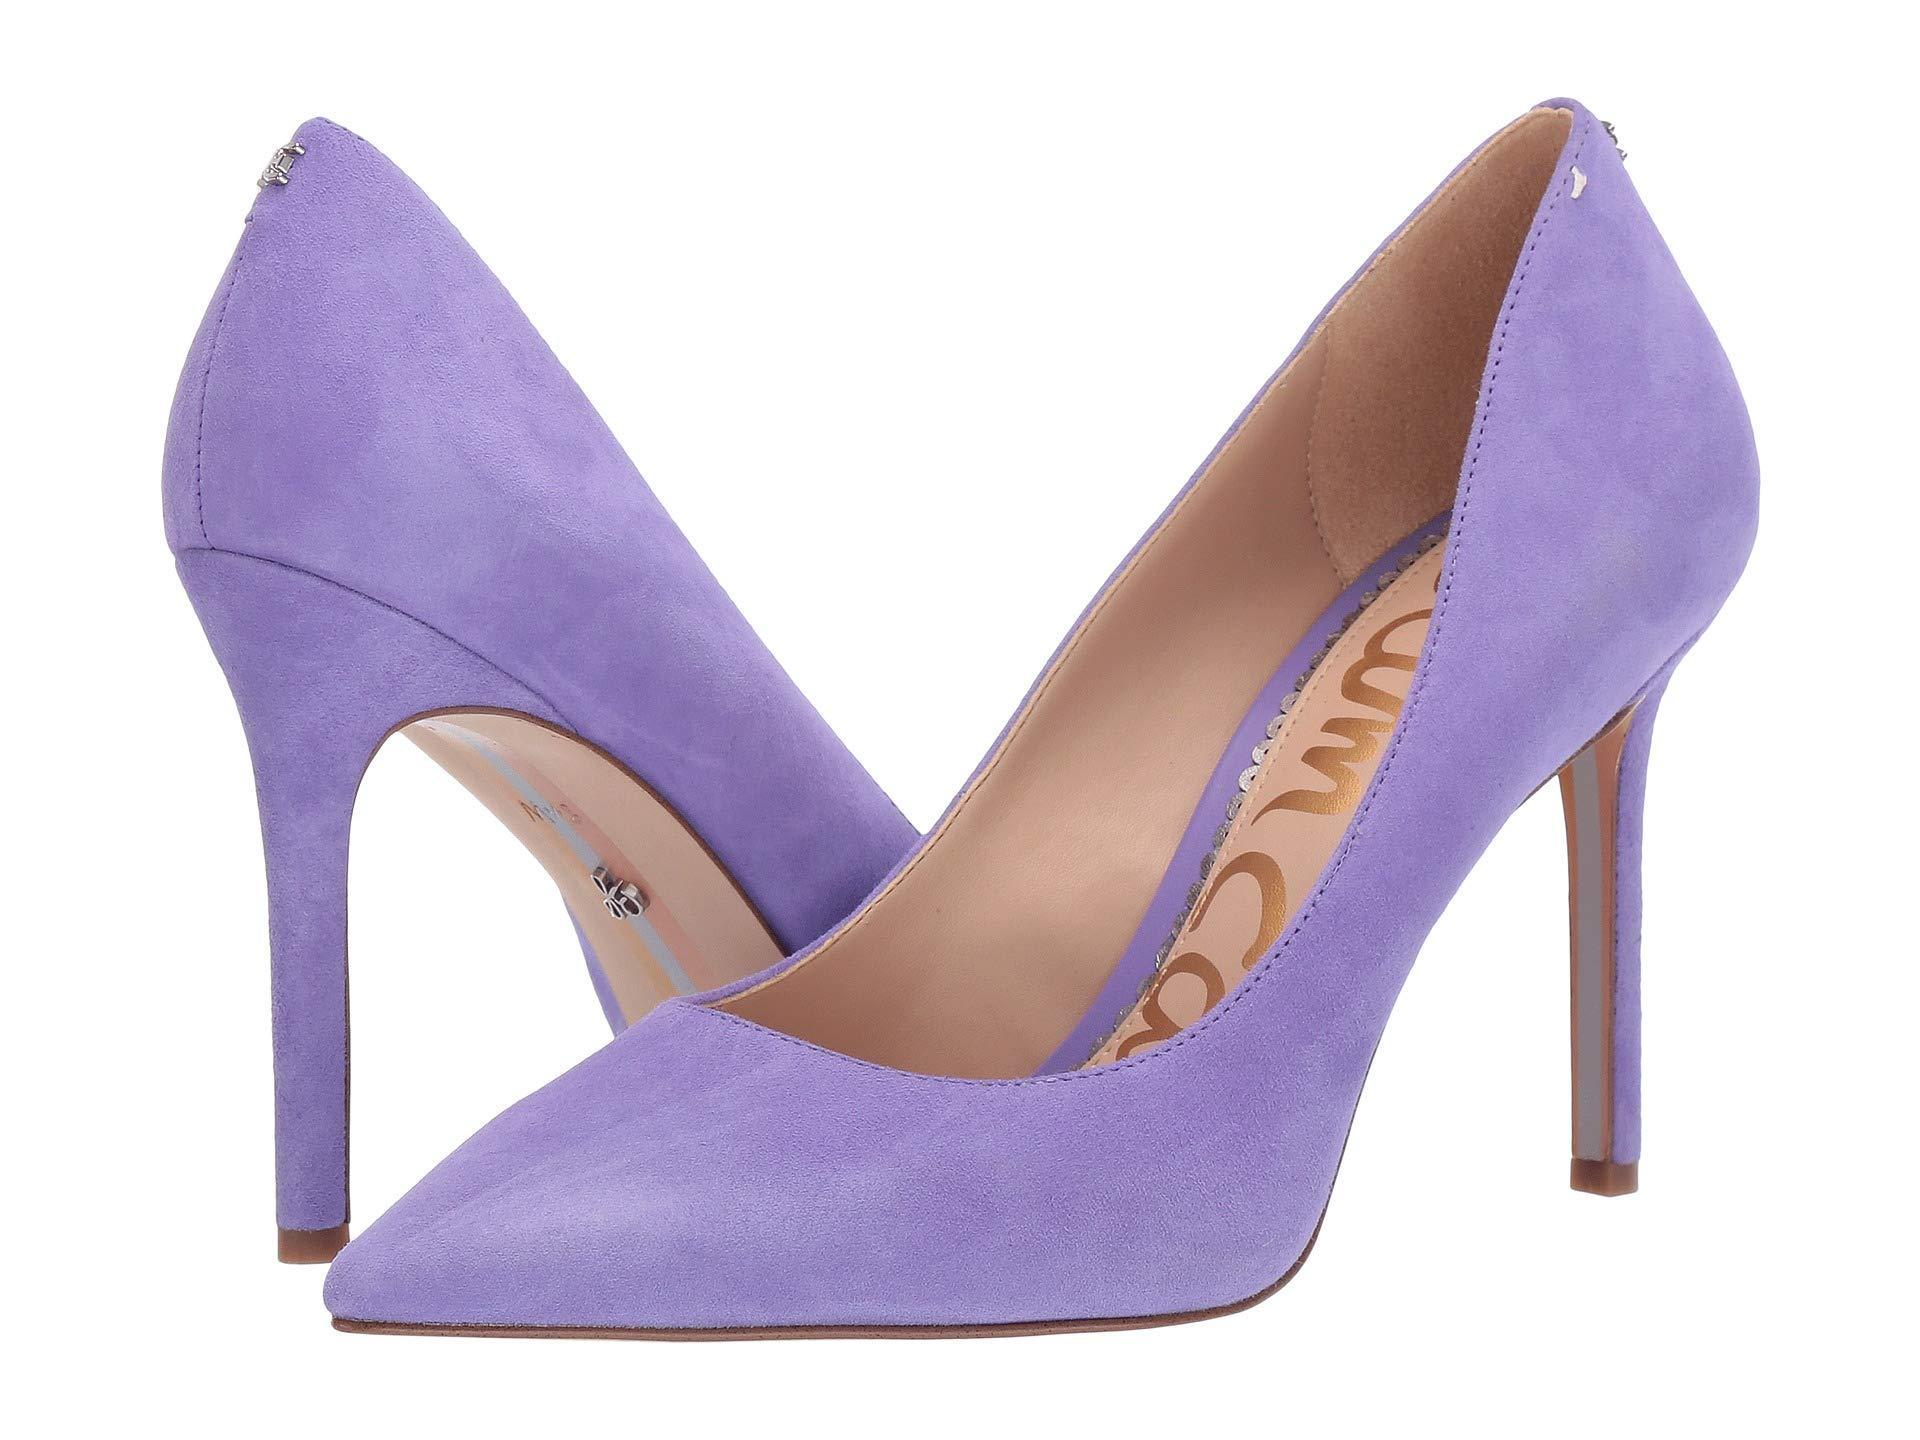 262fb03bd5e276 Lyst - Sam Edelman Hazel (rose Gold Mini Glitter) Women s Shoes in ...